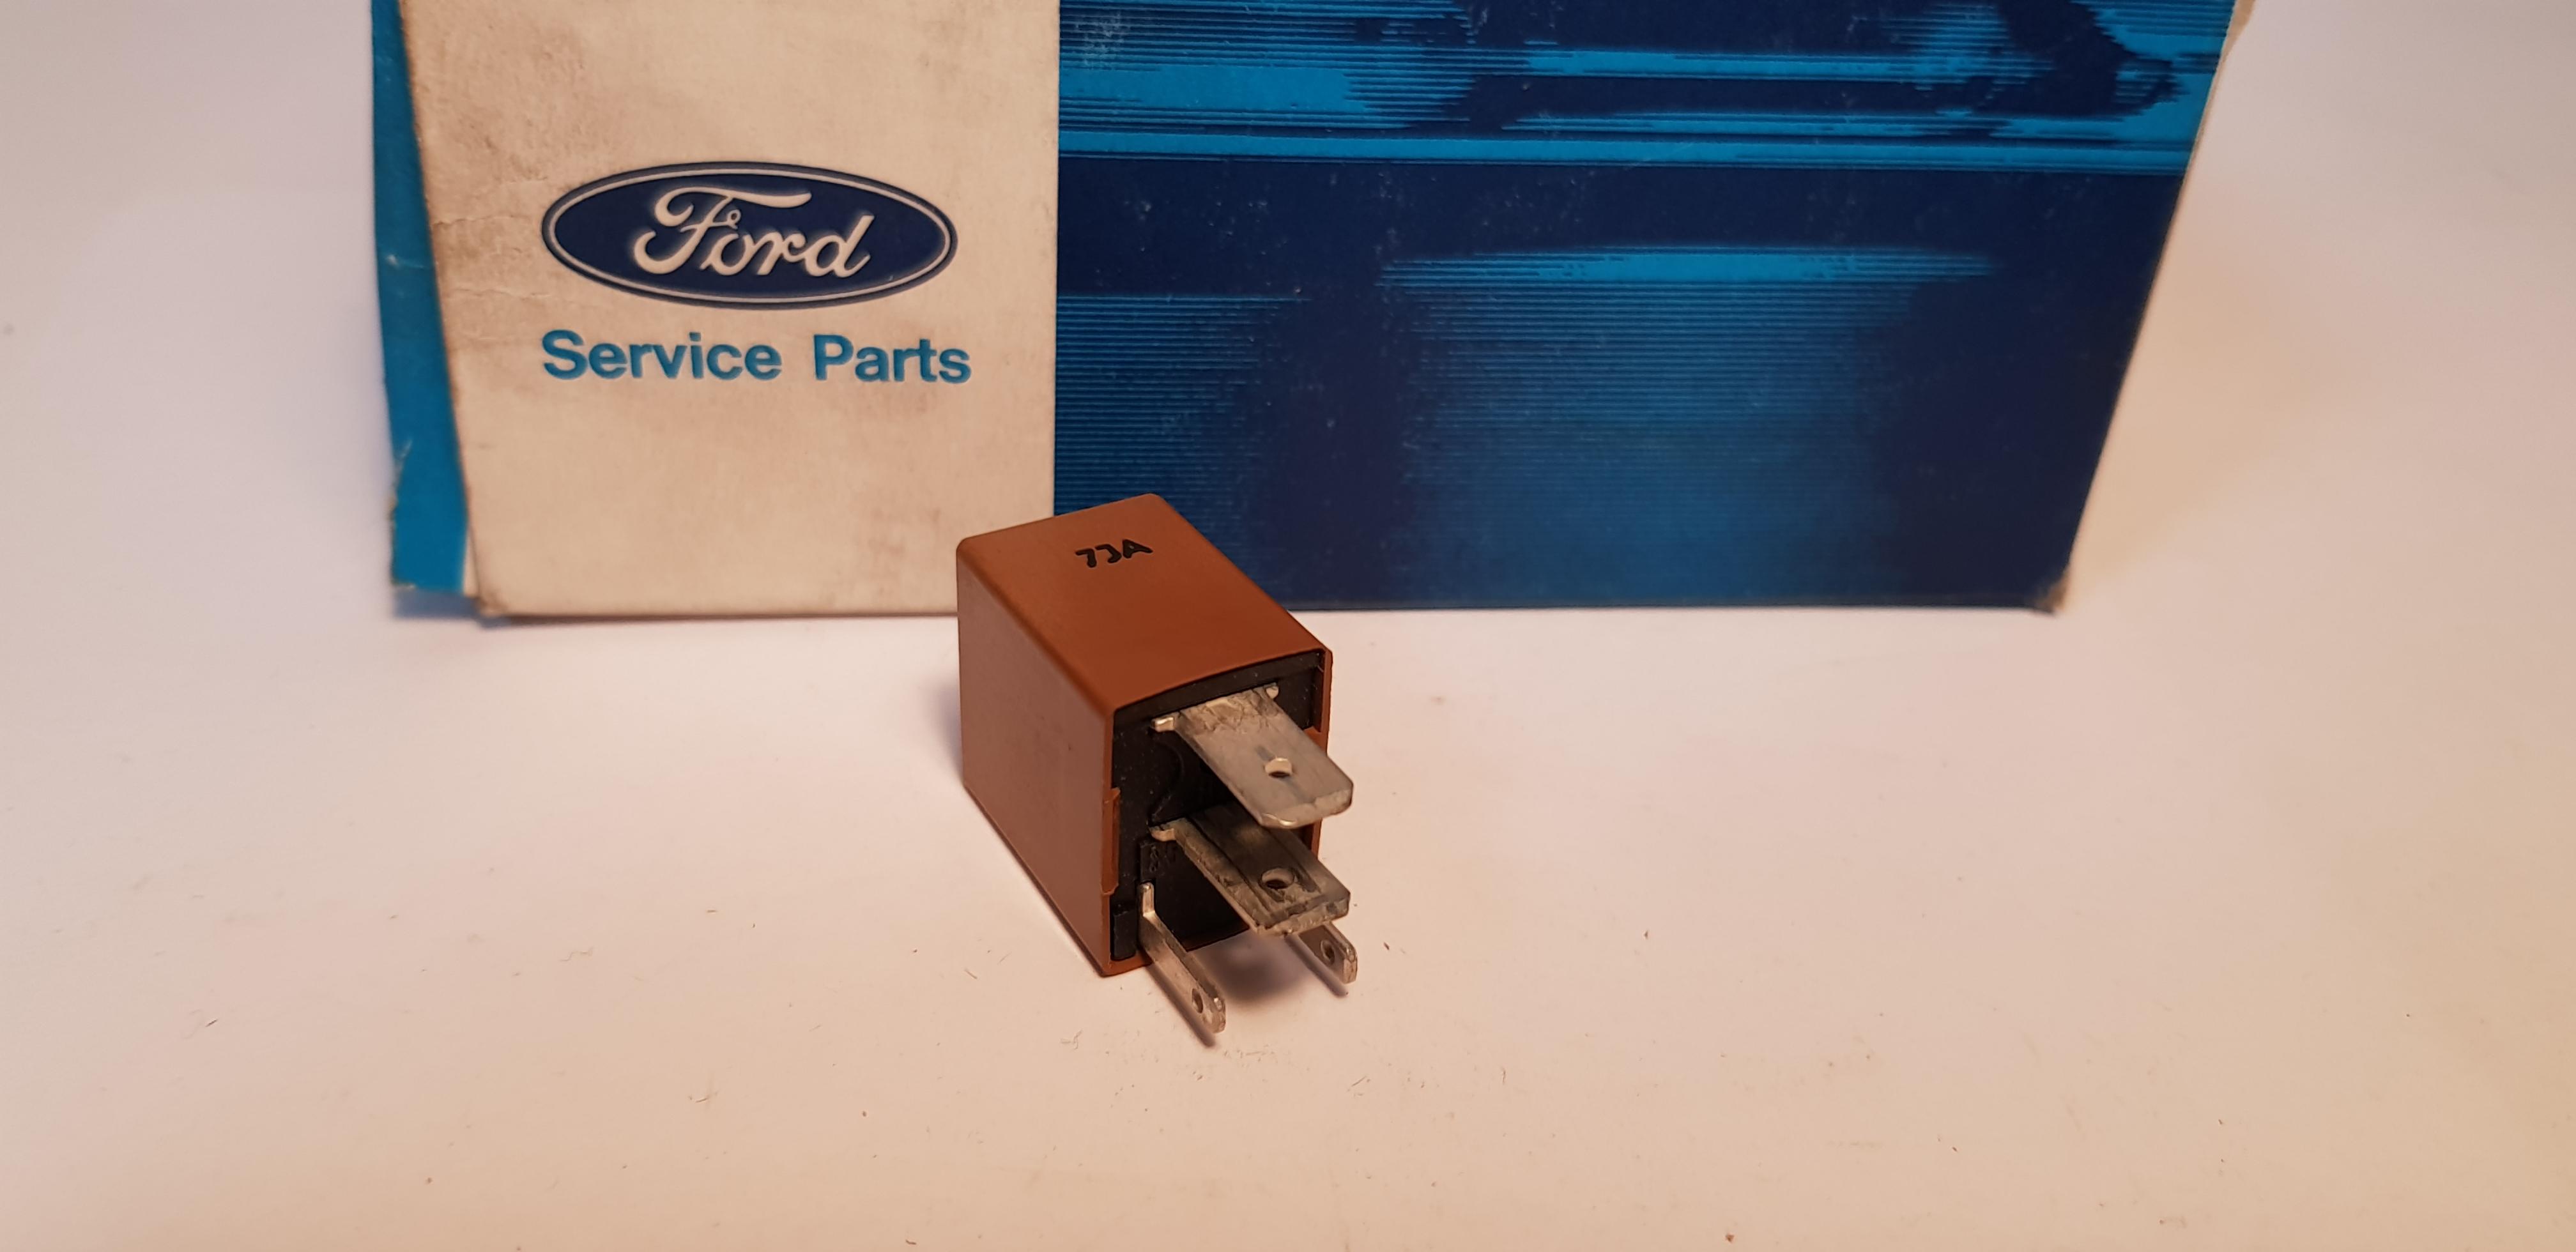 Ford V23073-A1001-X001 Relais Relay Relé Steuerung G1UHD 85GG 14N089 CA